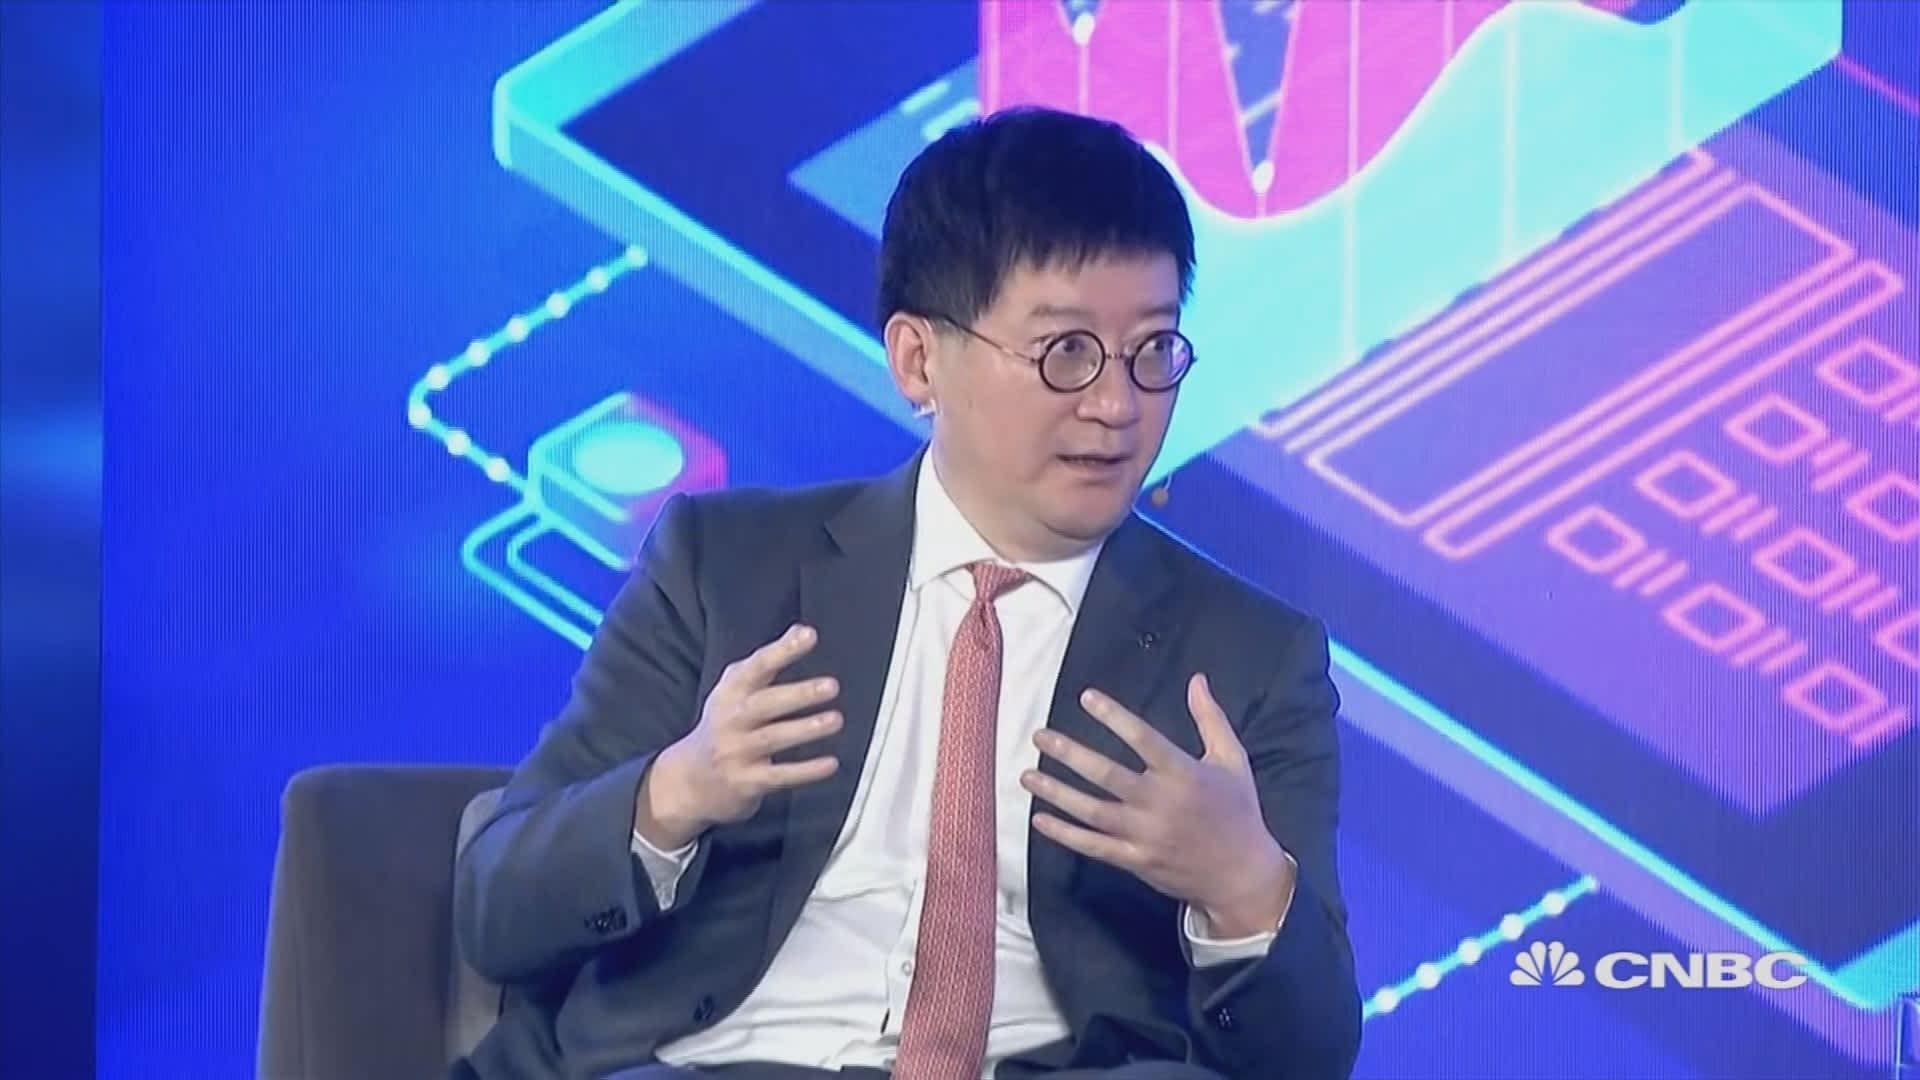 total digital china said - HD1920×1080